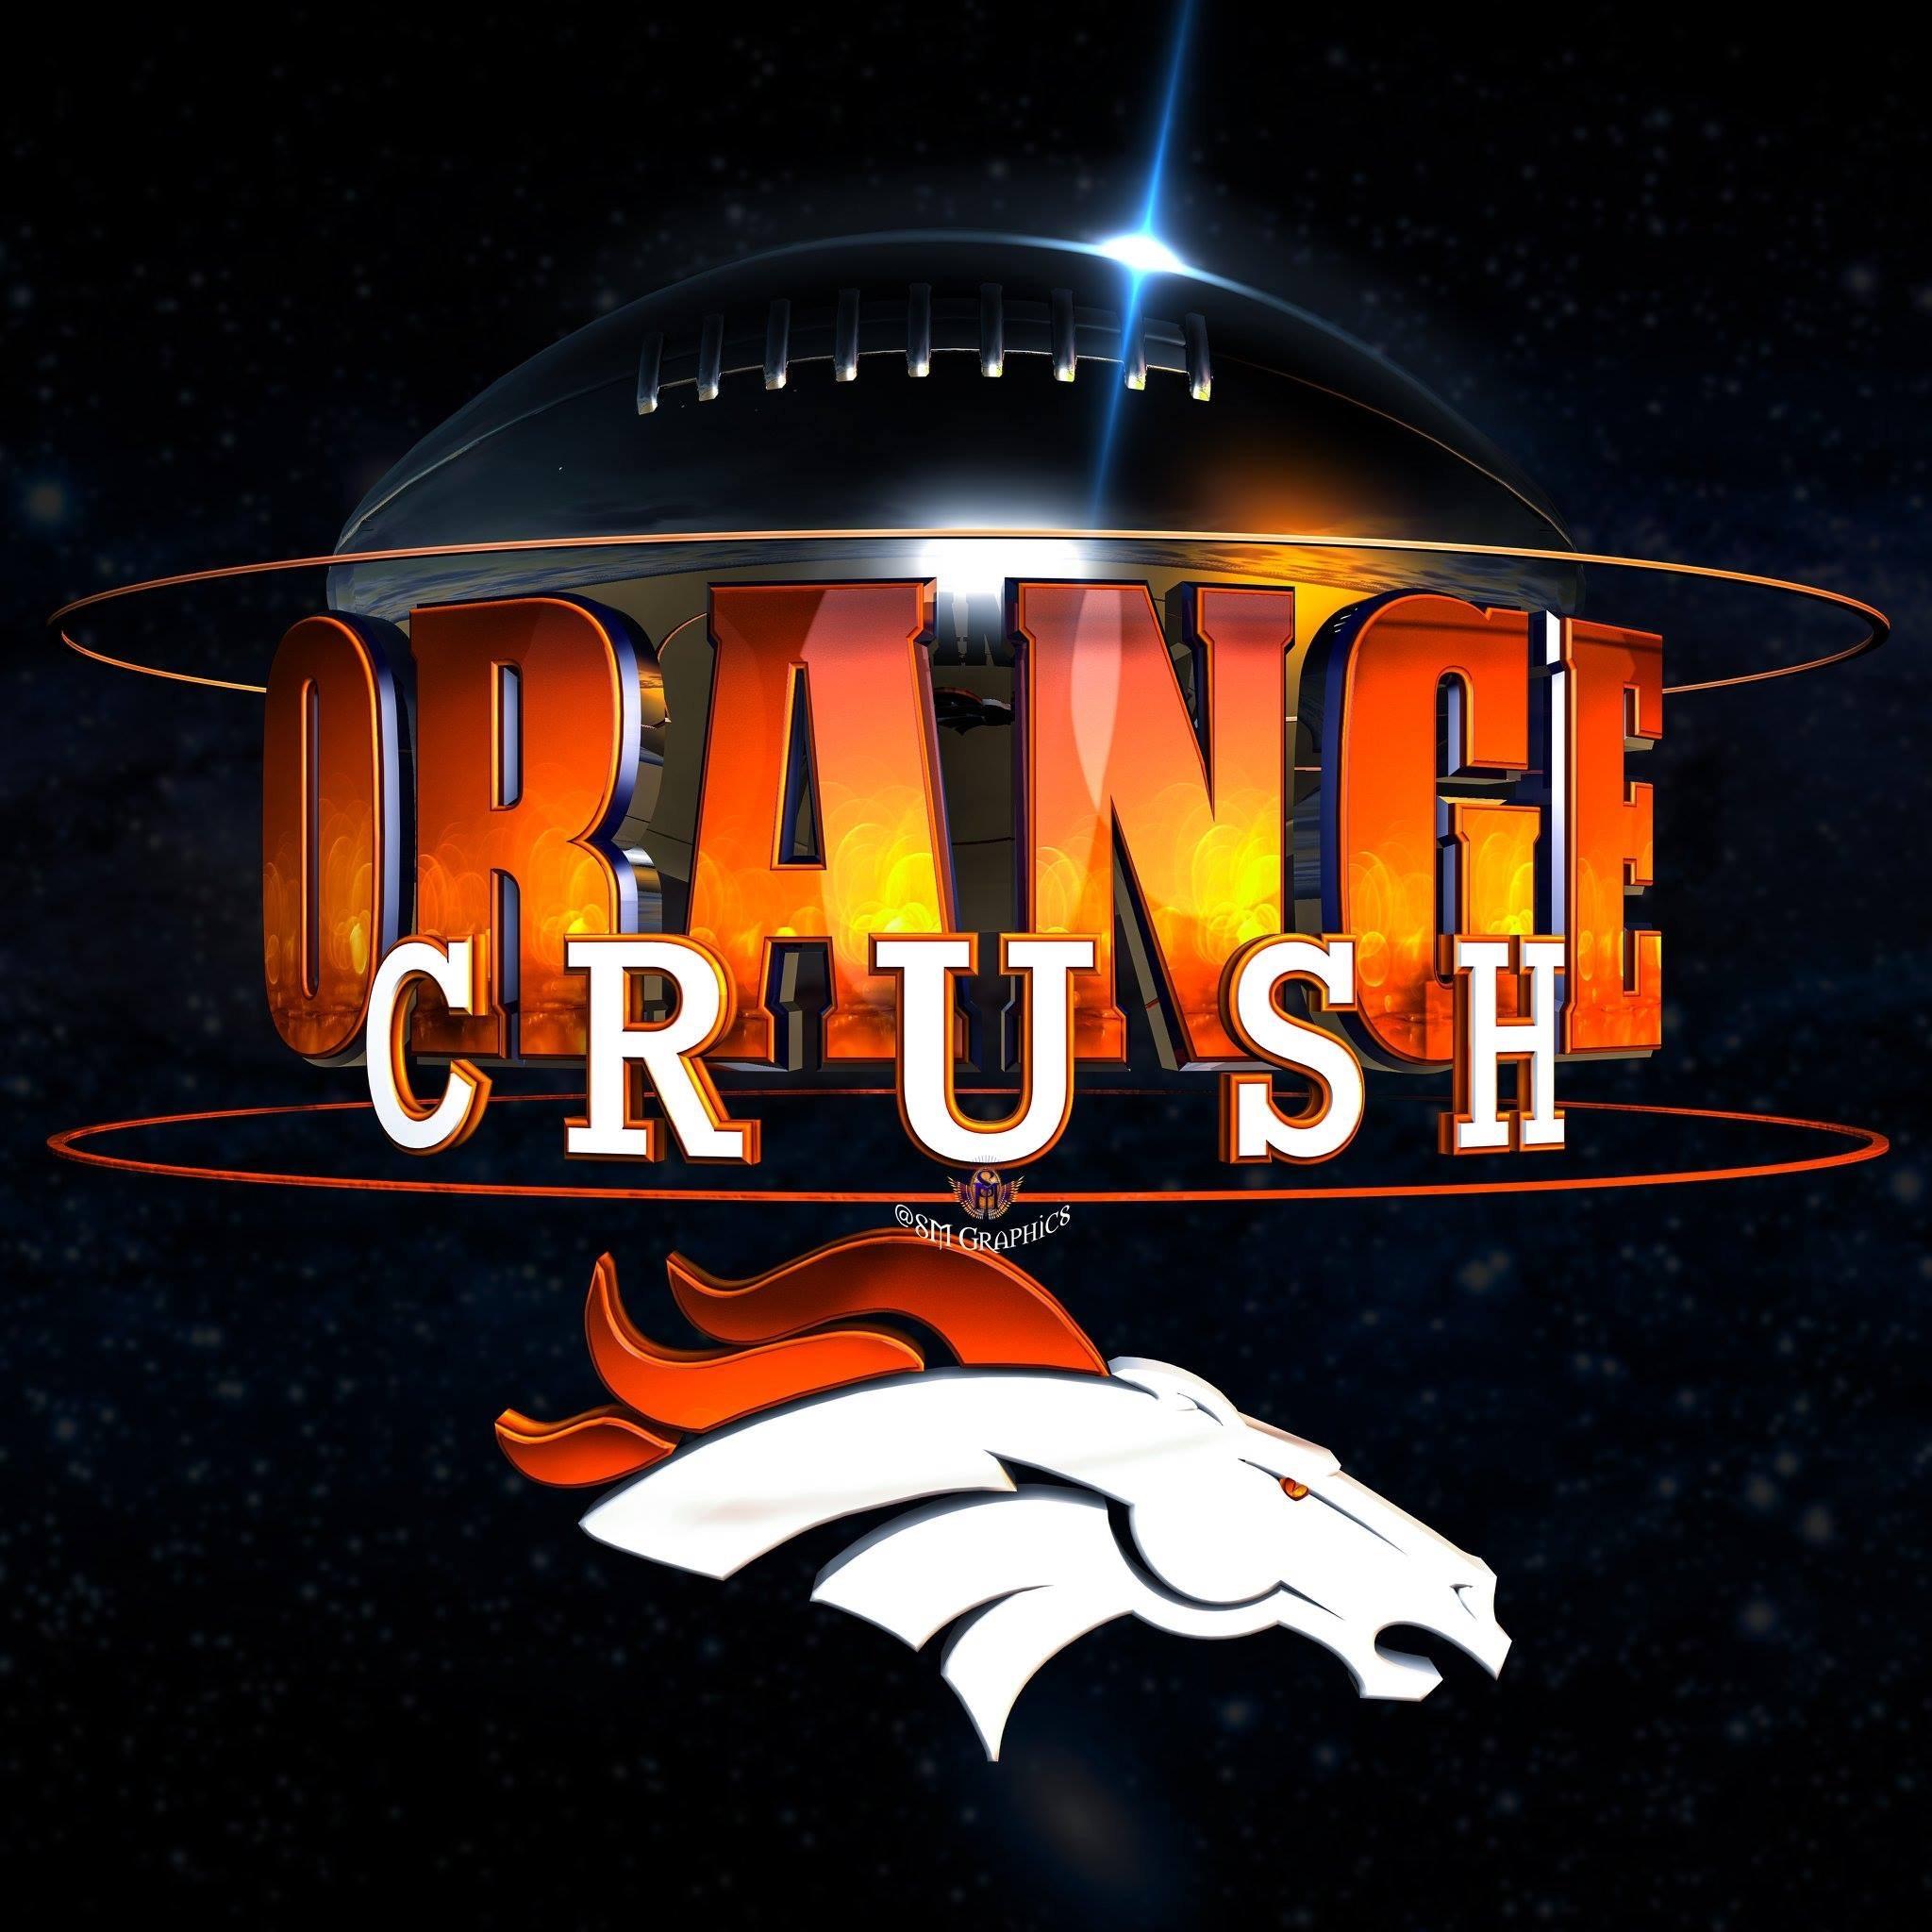 Team Player, Sports Photos, Peyton Manning, Orange Crush, Denver Broncos,  Nfl, Drinks, Football